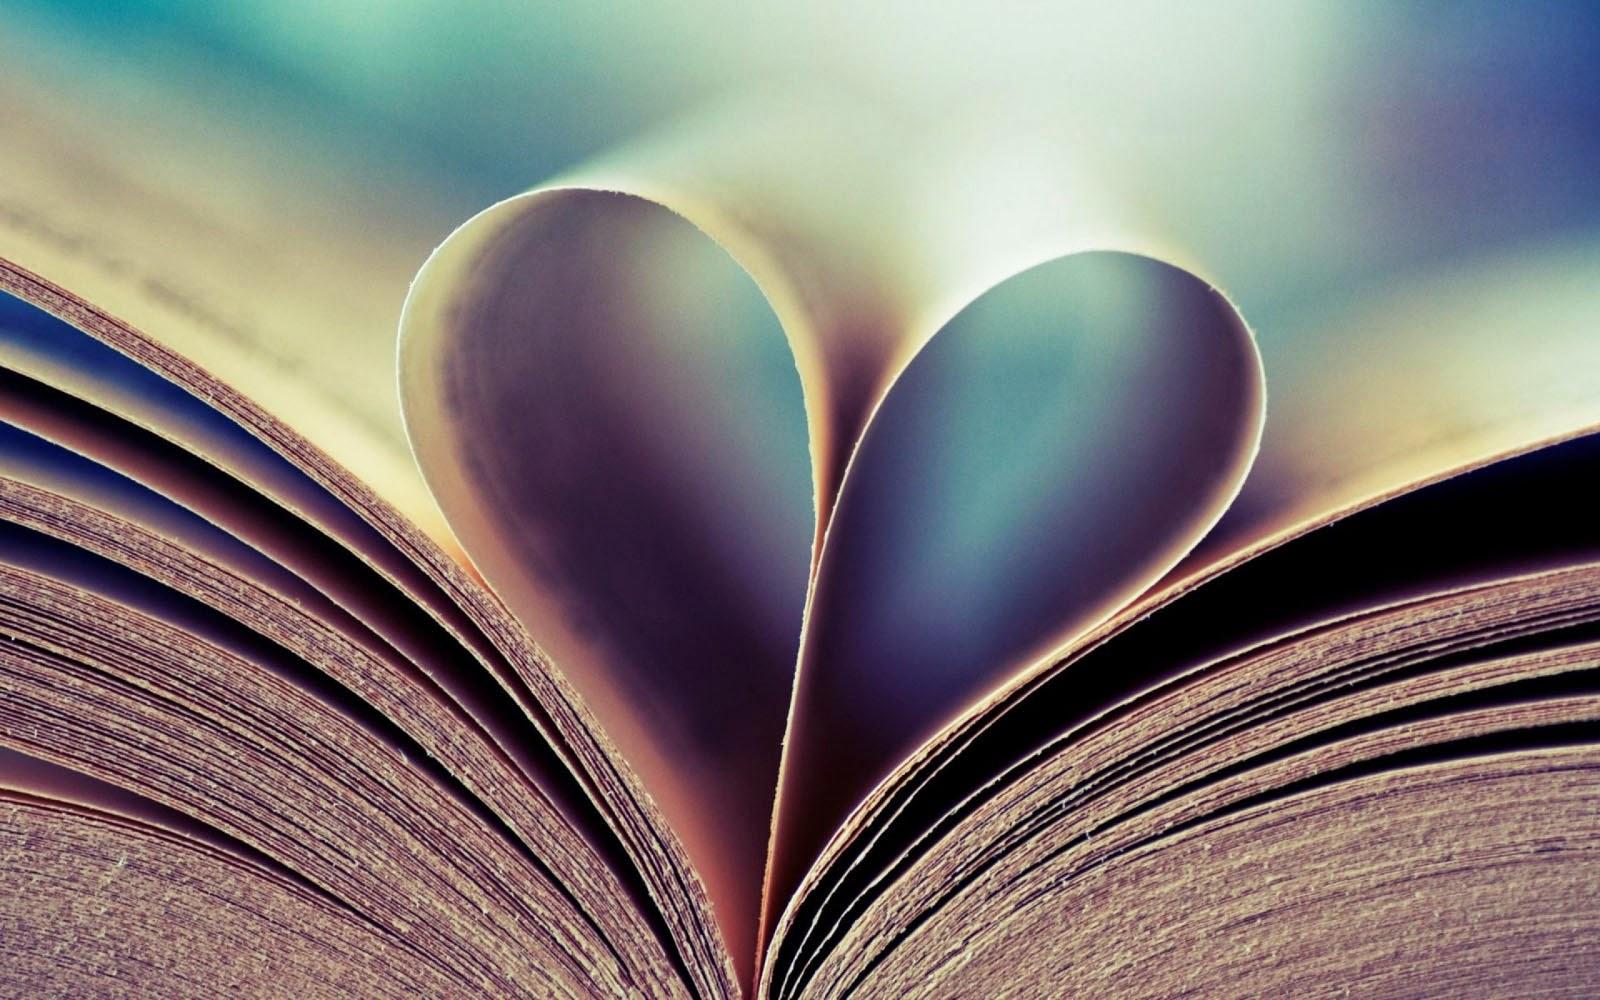 wallpapers: Heart Book Wallpapers